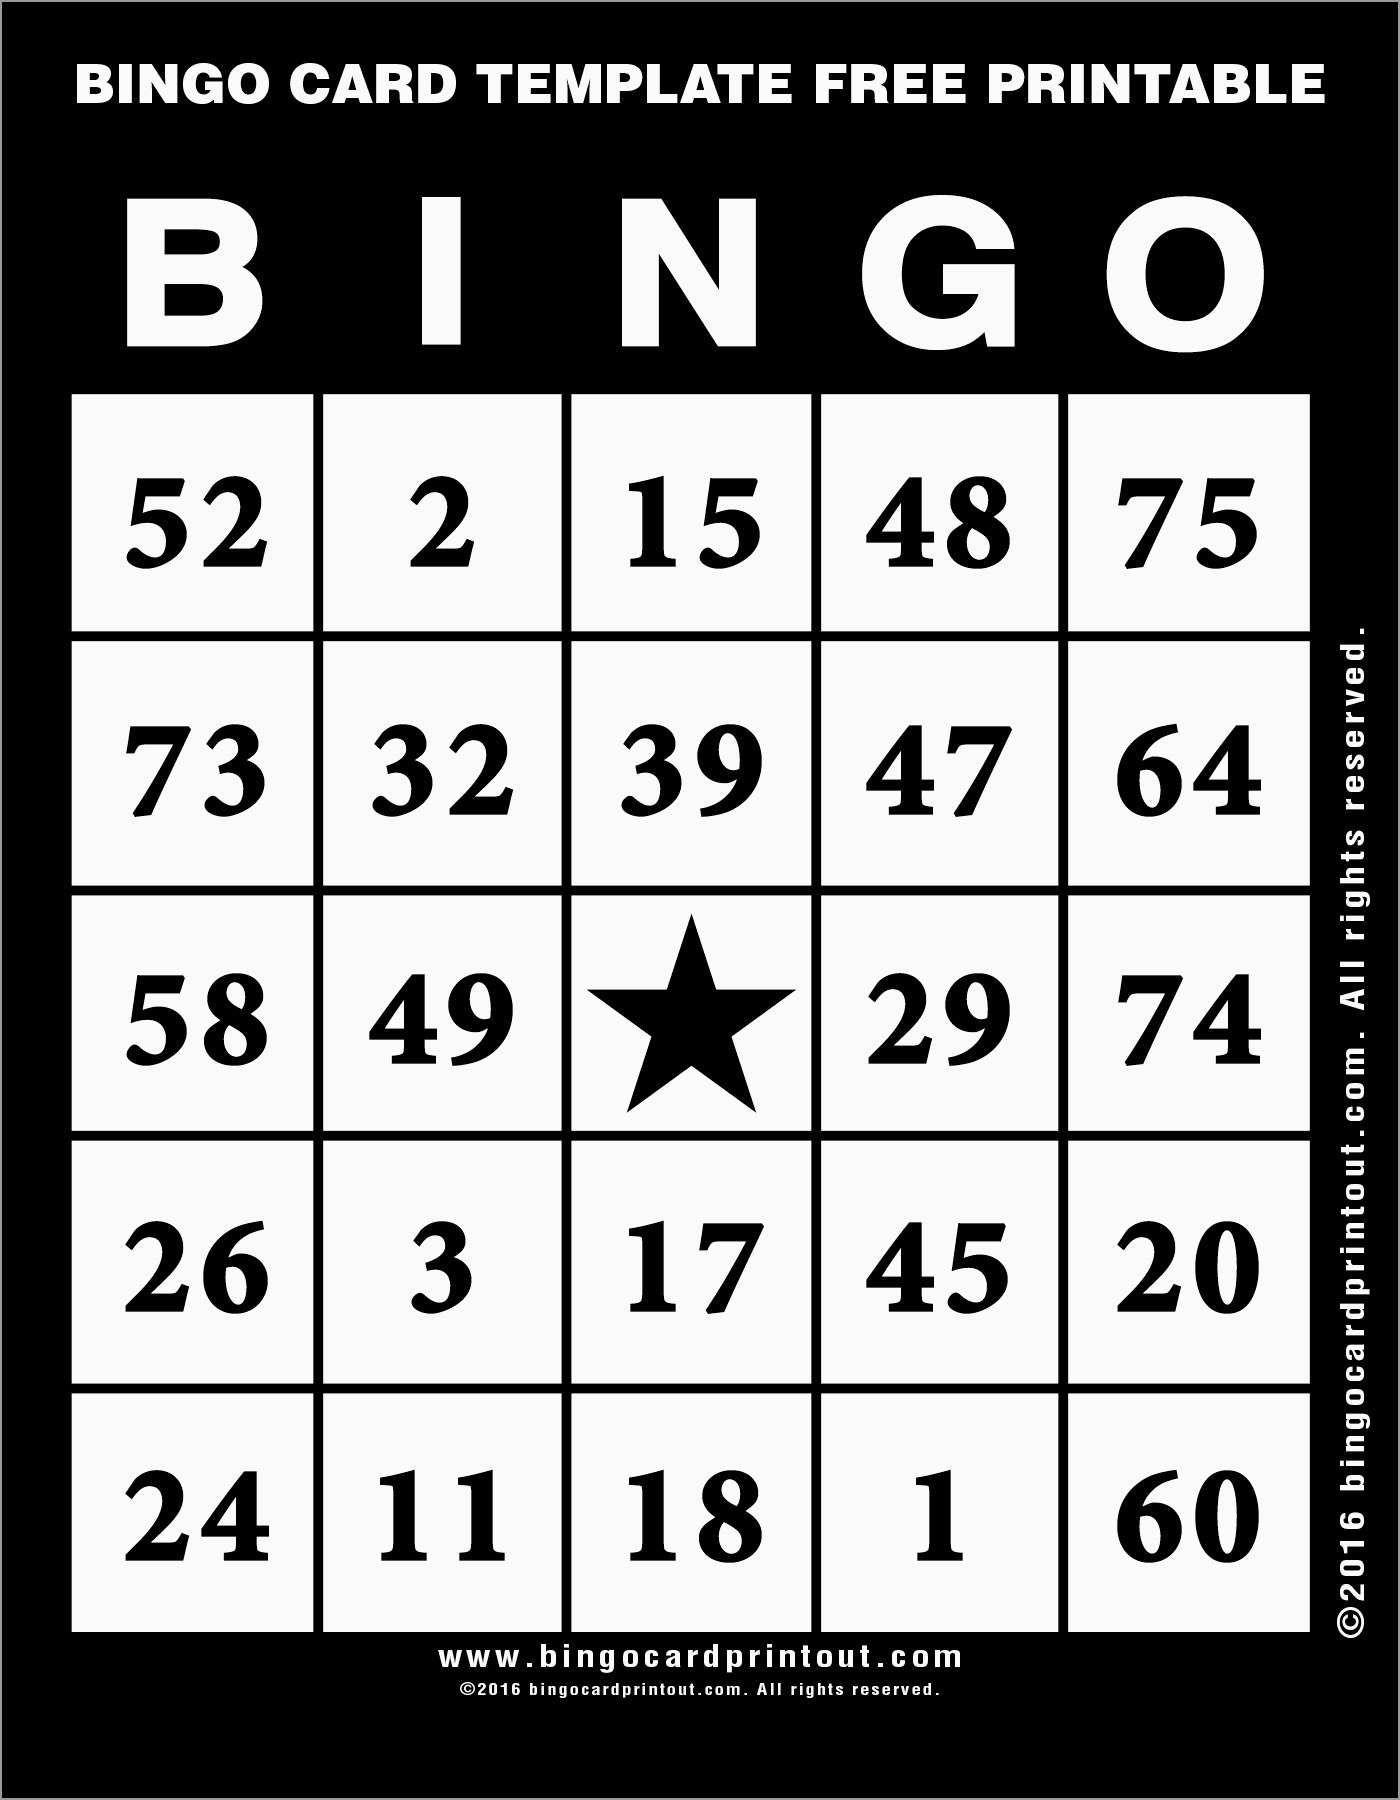 Bingo Template Excel Bingo Card Template Bingo Template Trading Card Template